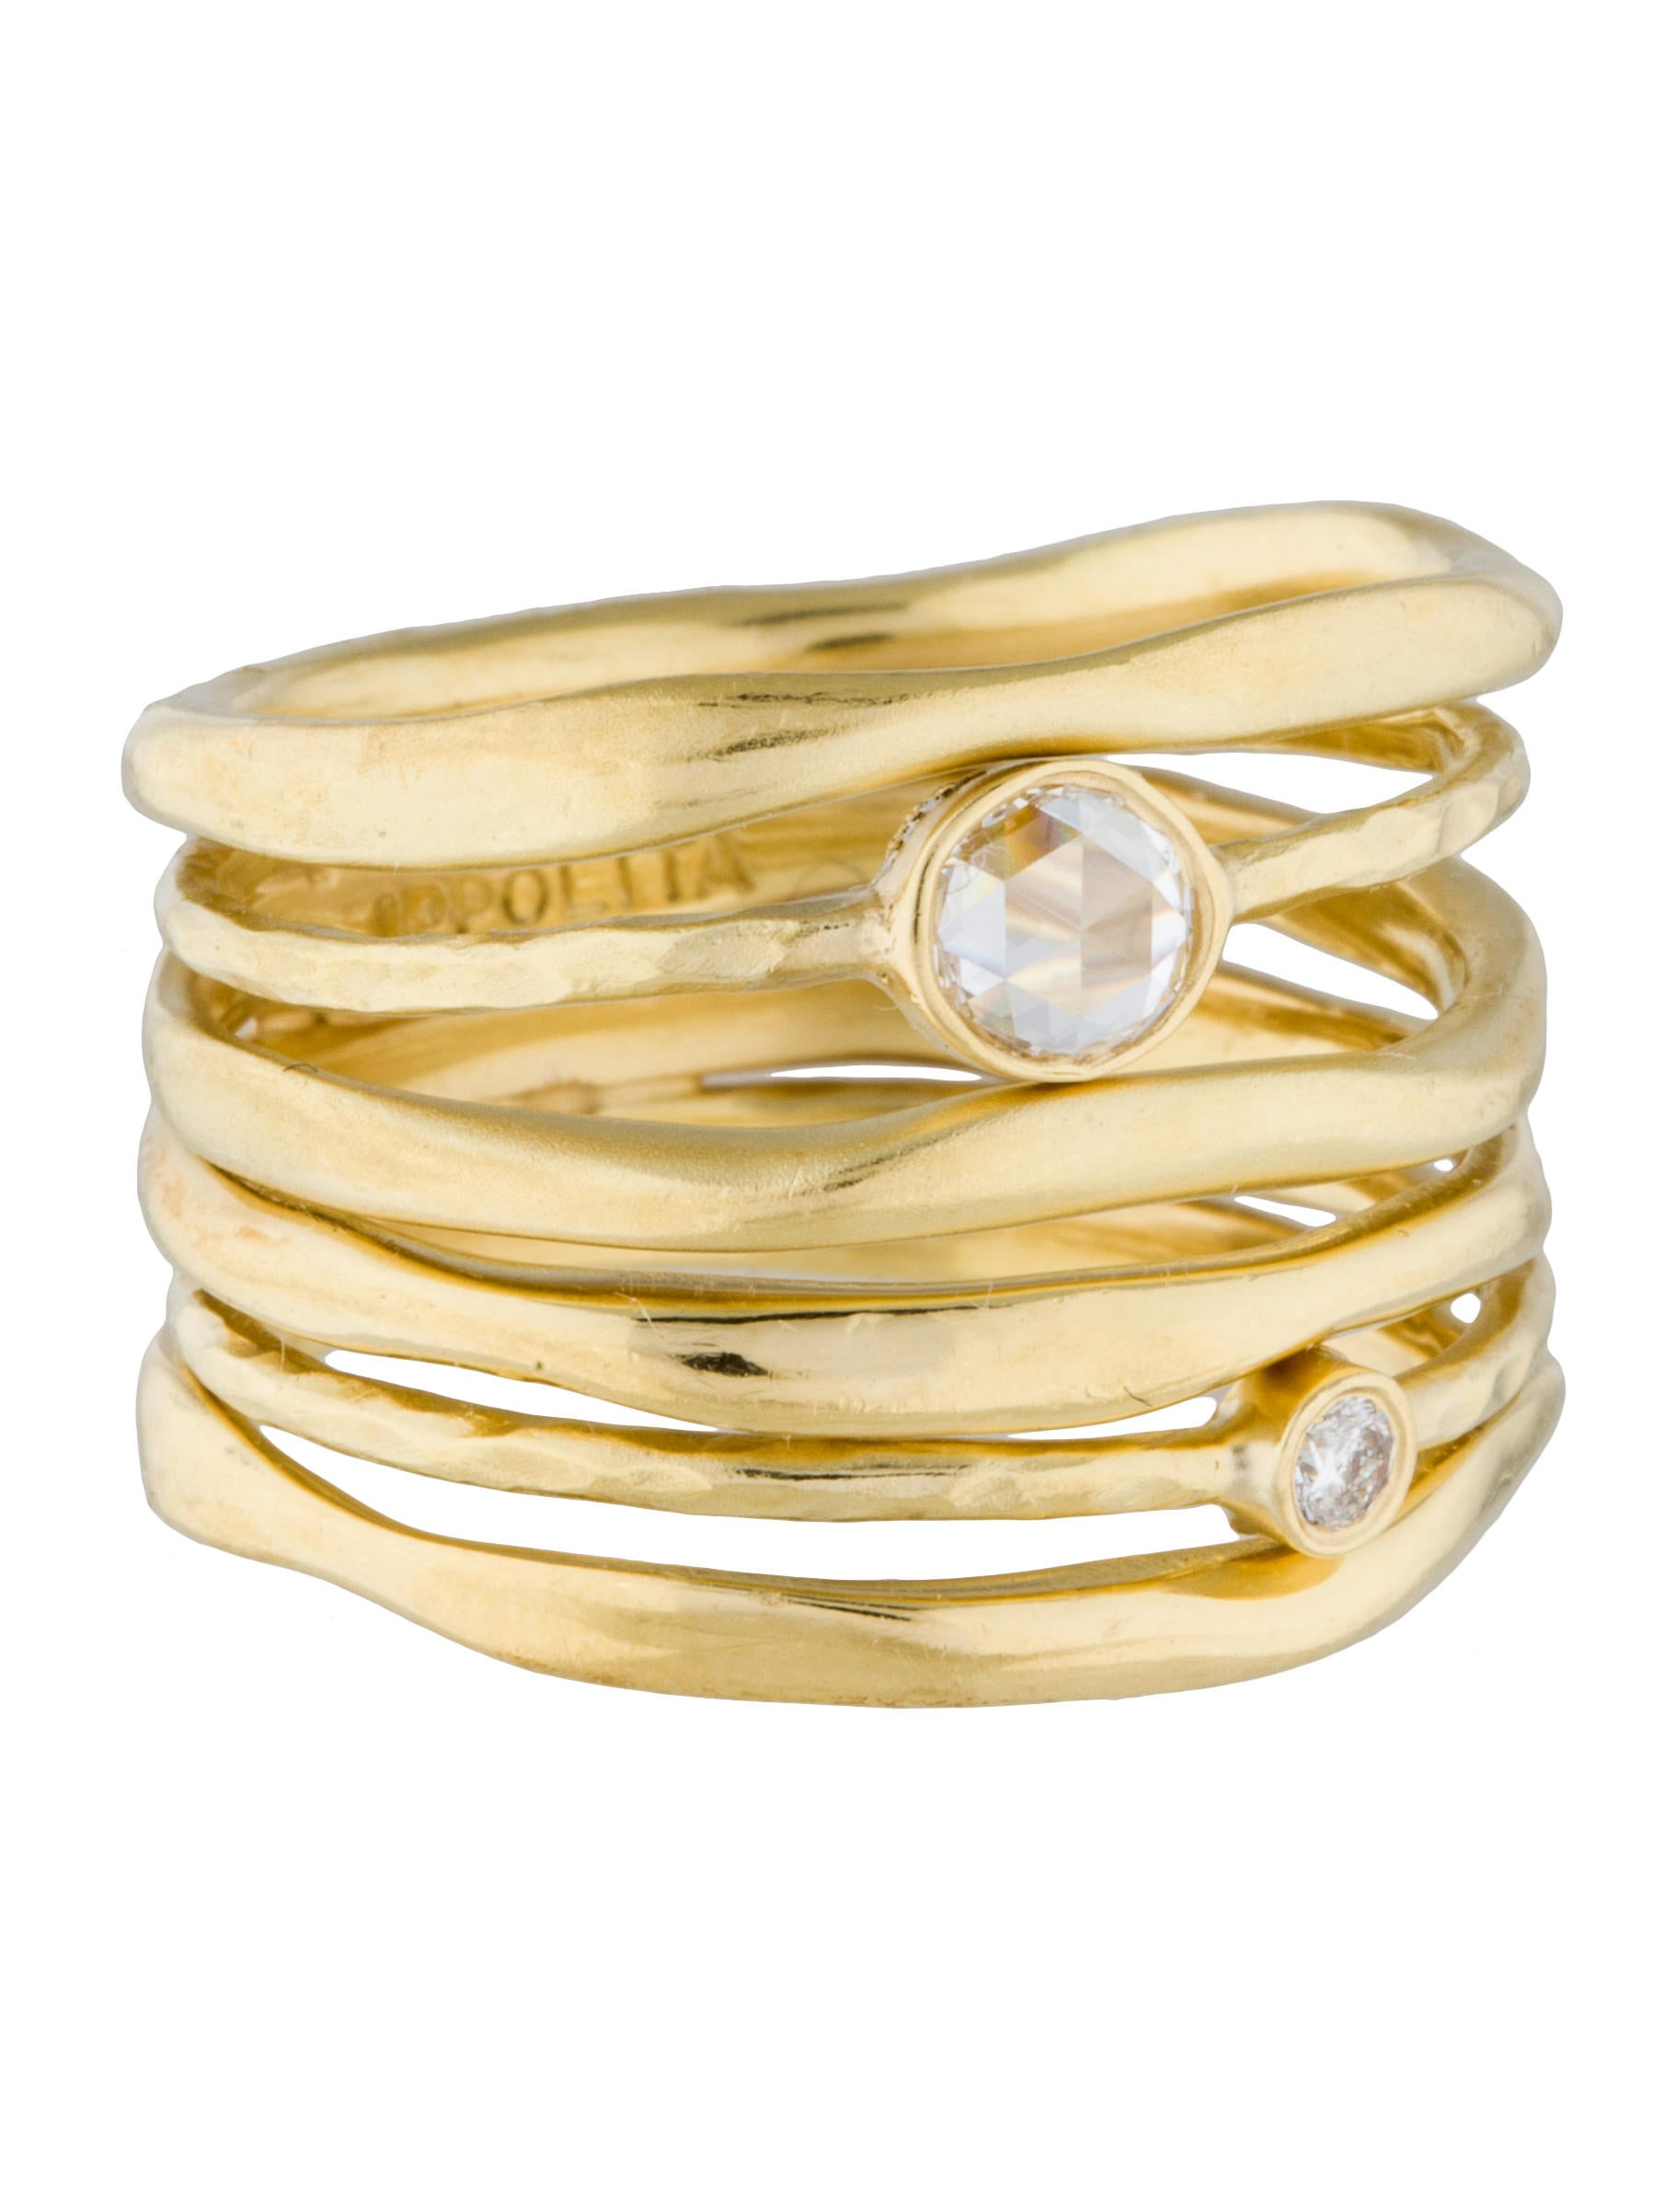 Ippolita Diamond Movie Star Stacked Ring  Rings. Periwinkle Rings. Starcraft Rings. Detailed Band Engagement Rings. 18ct Wedding Rings. Vape Rings. Gia Wedding Rings. Mountain Wedding Rings. Pansy Rings